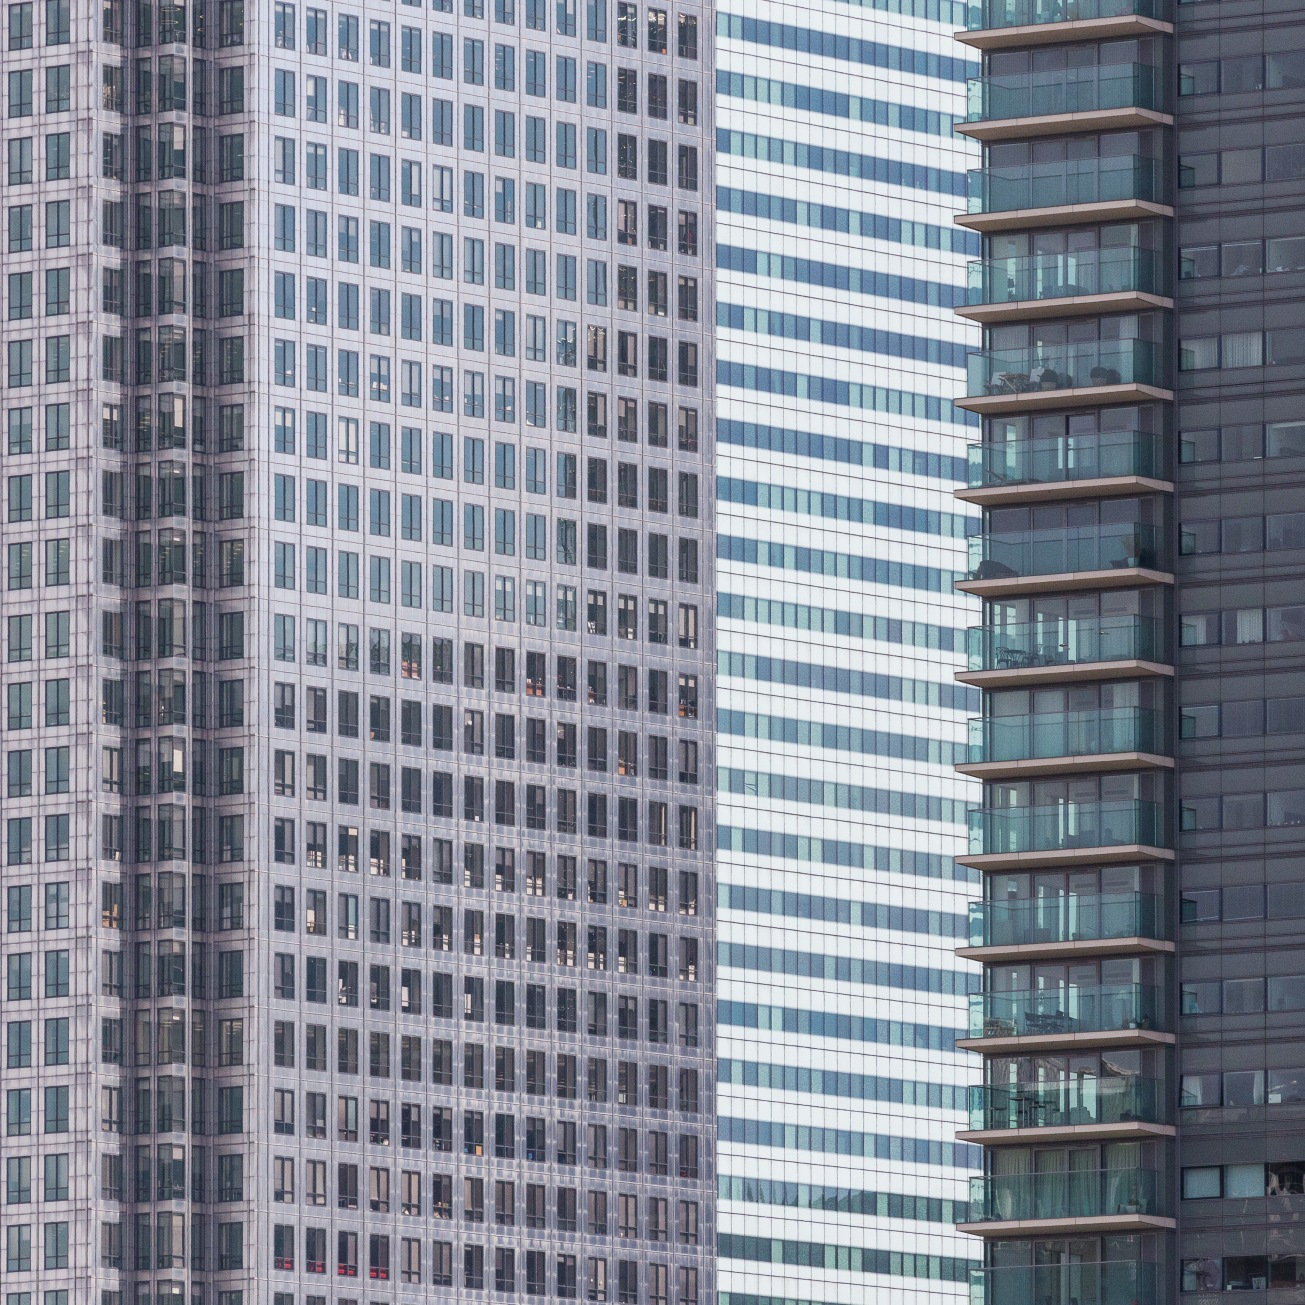 One Canada Square, Canary Wharf